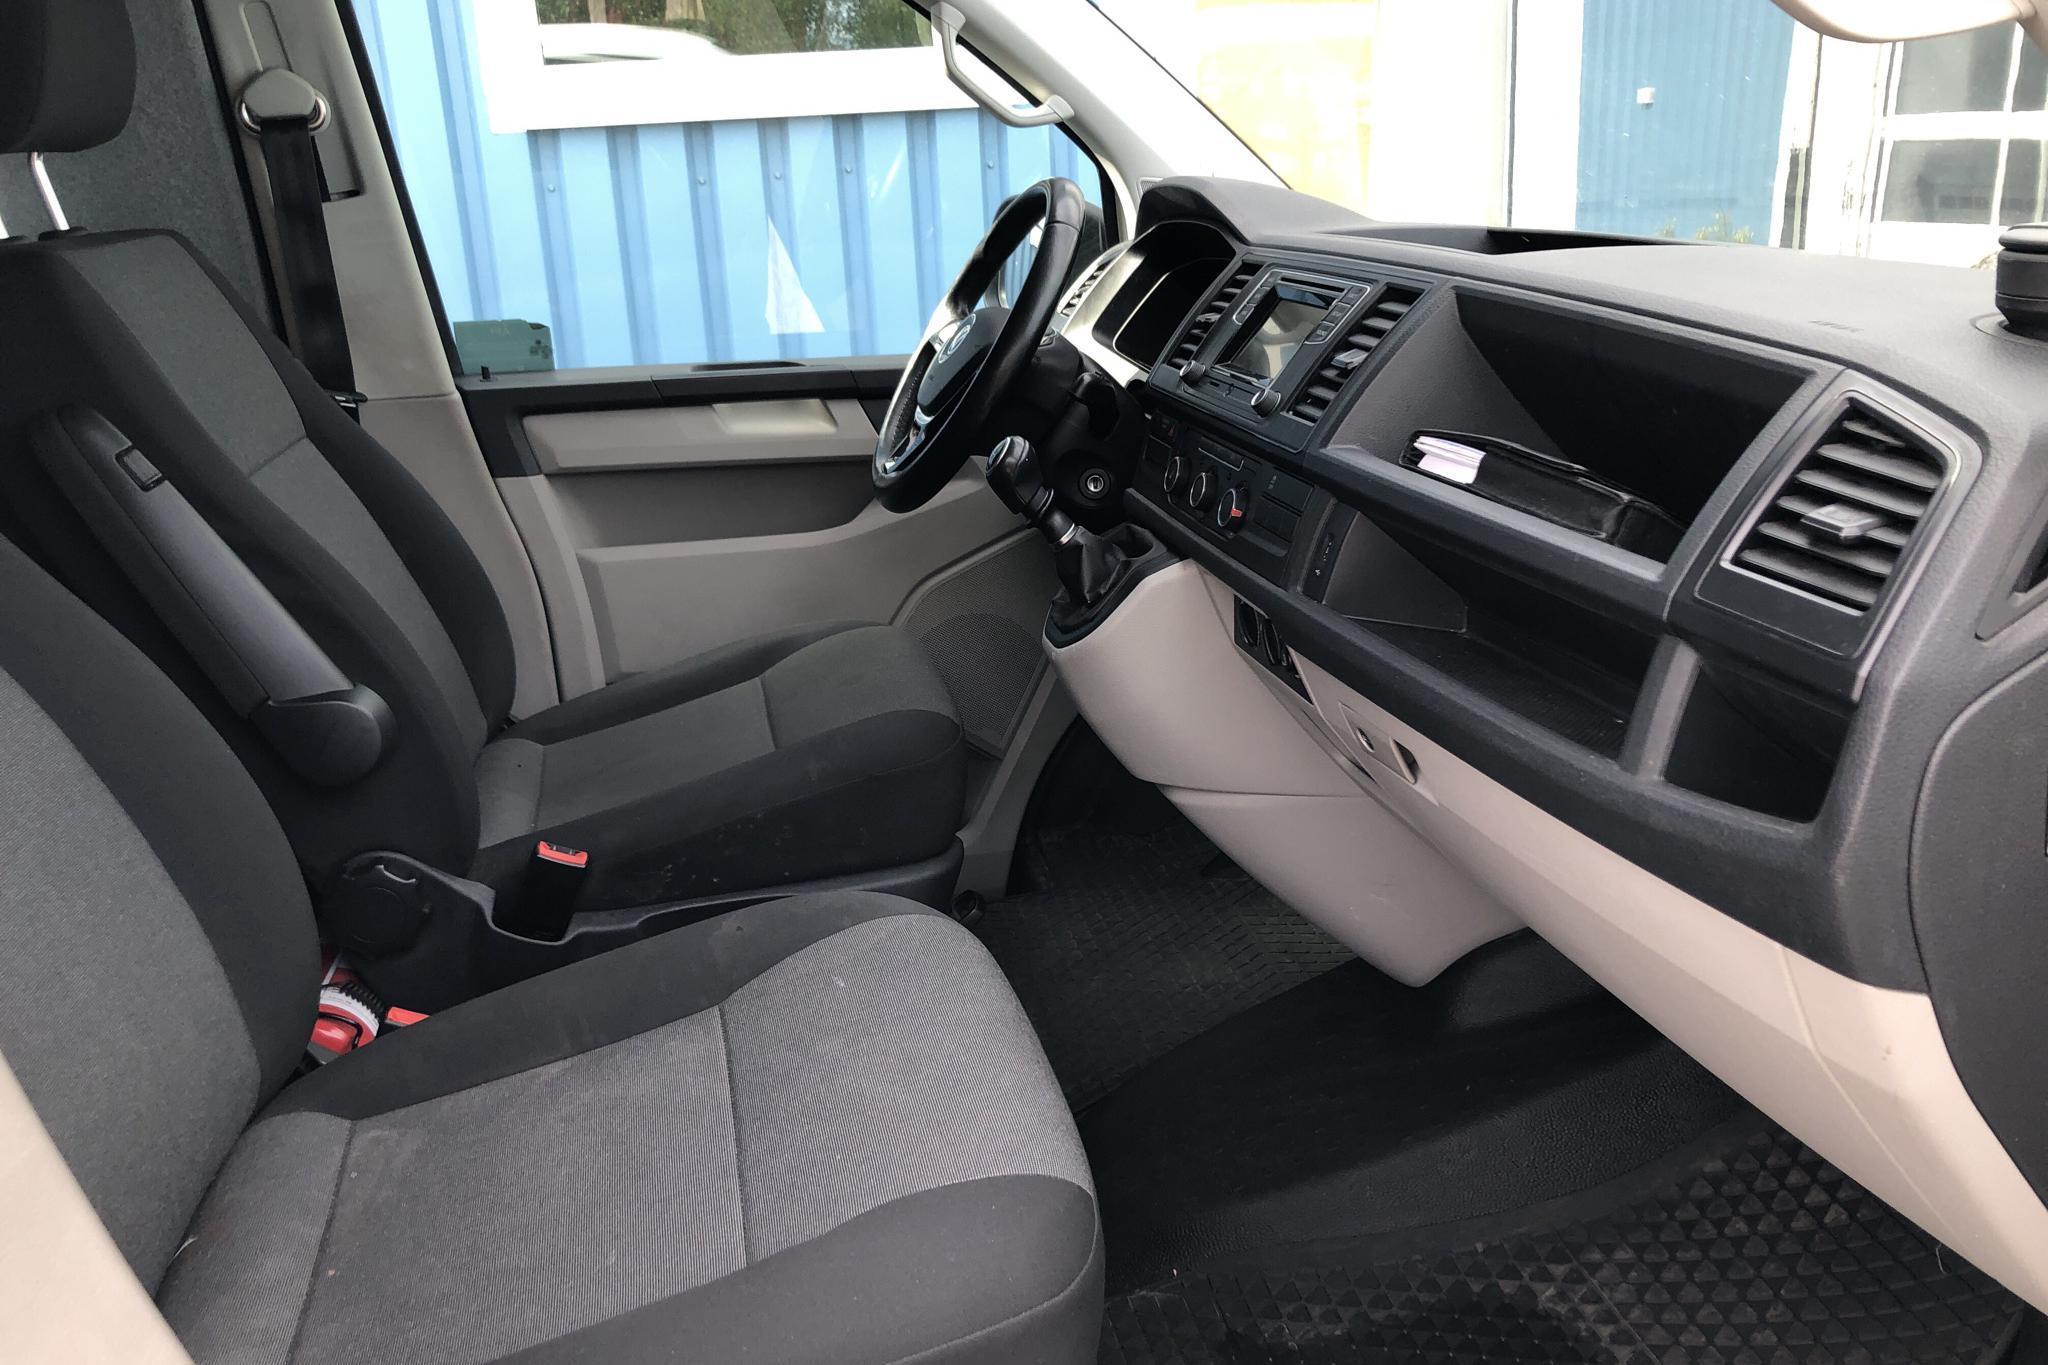 VW Transporter T6 2.0 TDI BMT Skåp 4MOTION (150hk) - 101 370 km - Manual - white - 2017